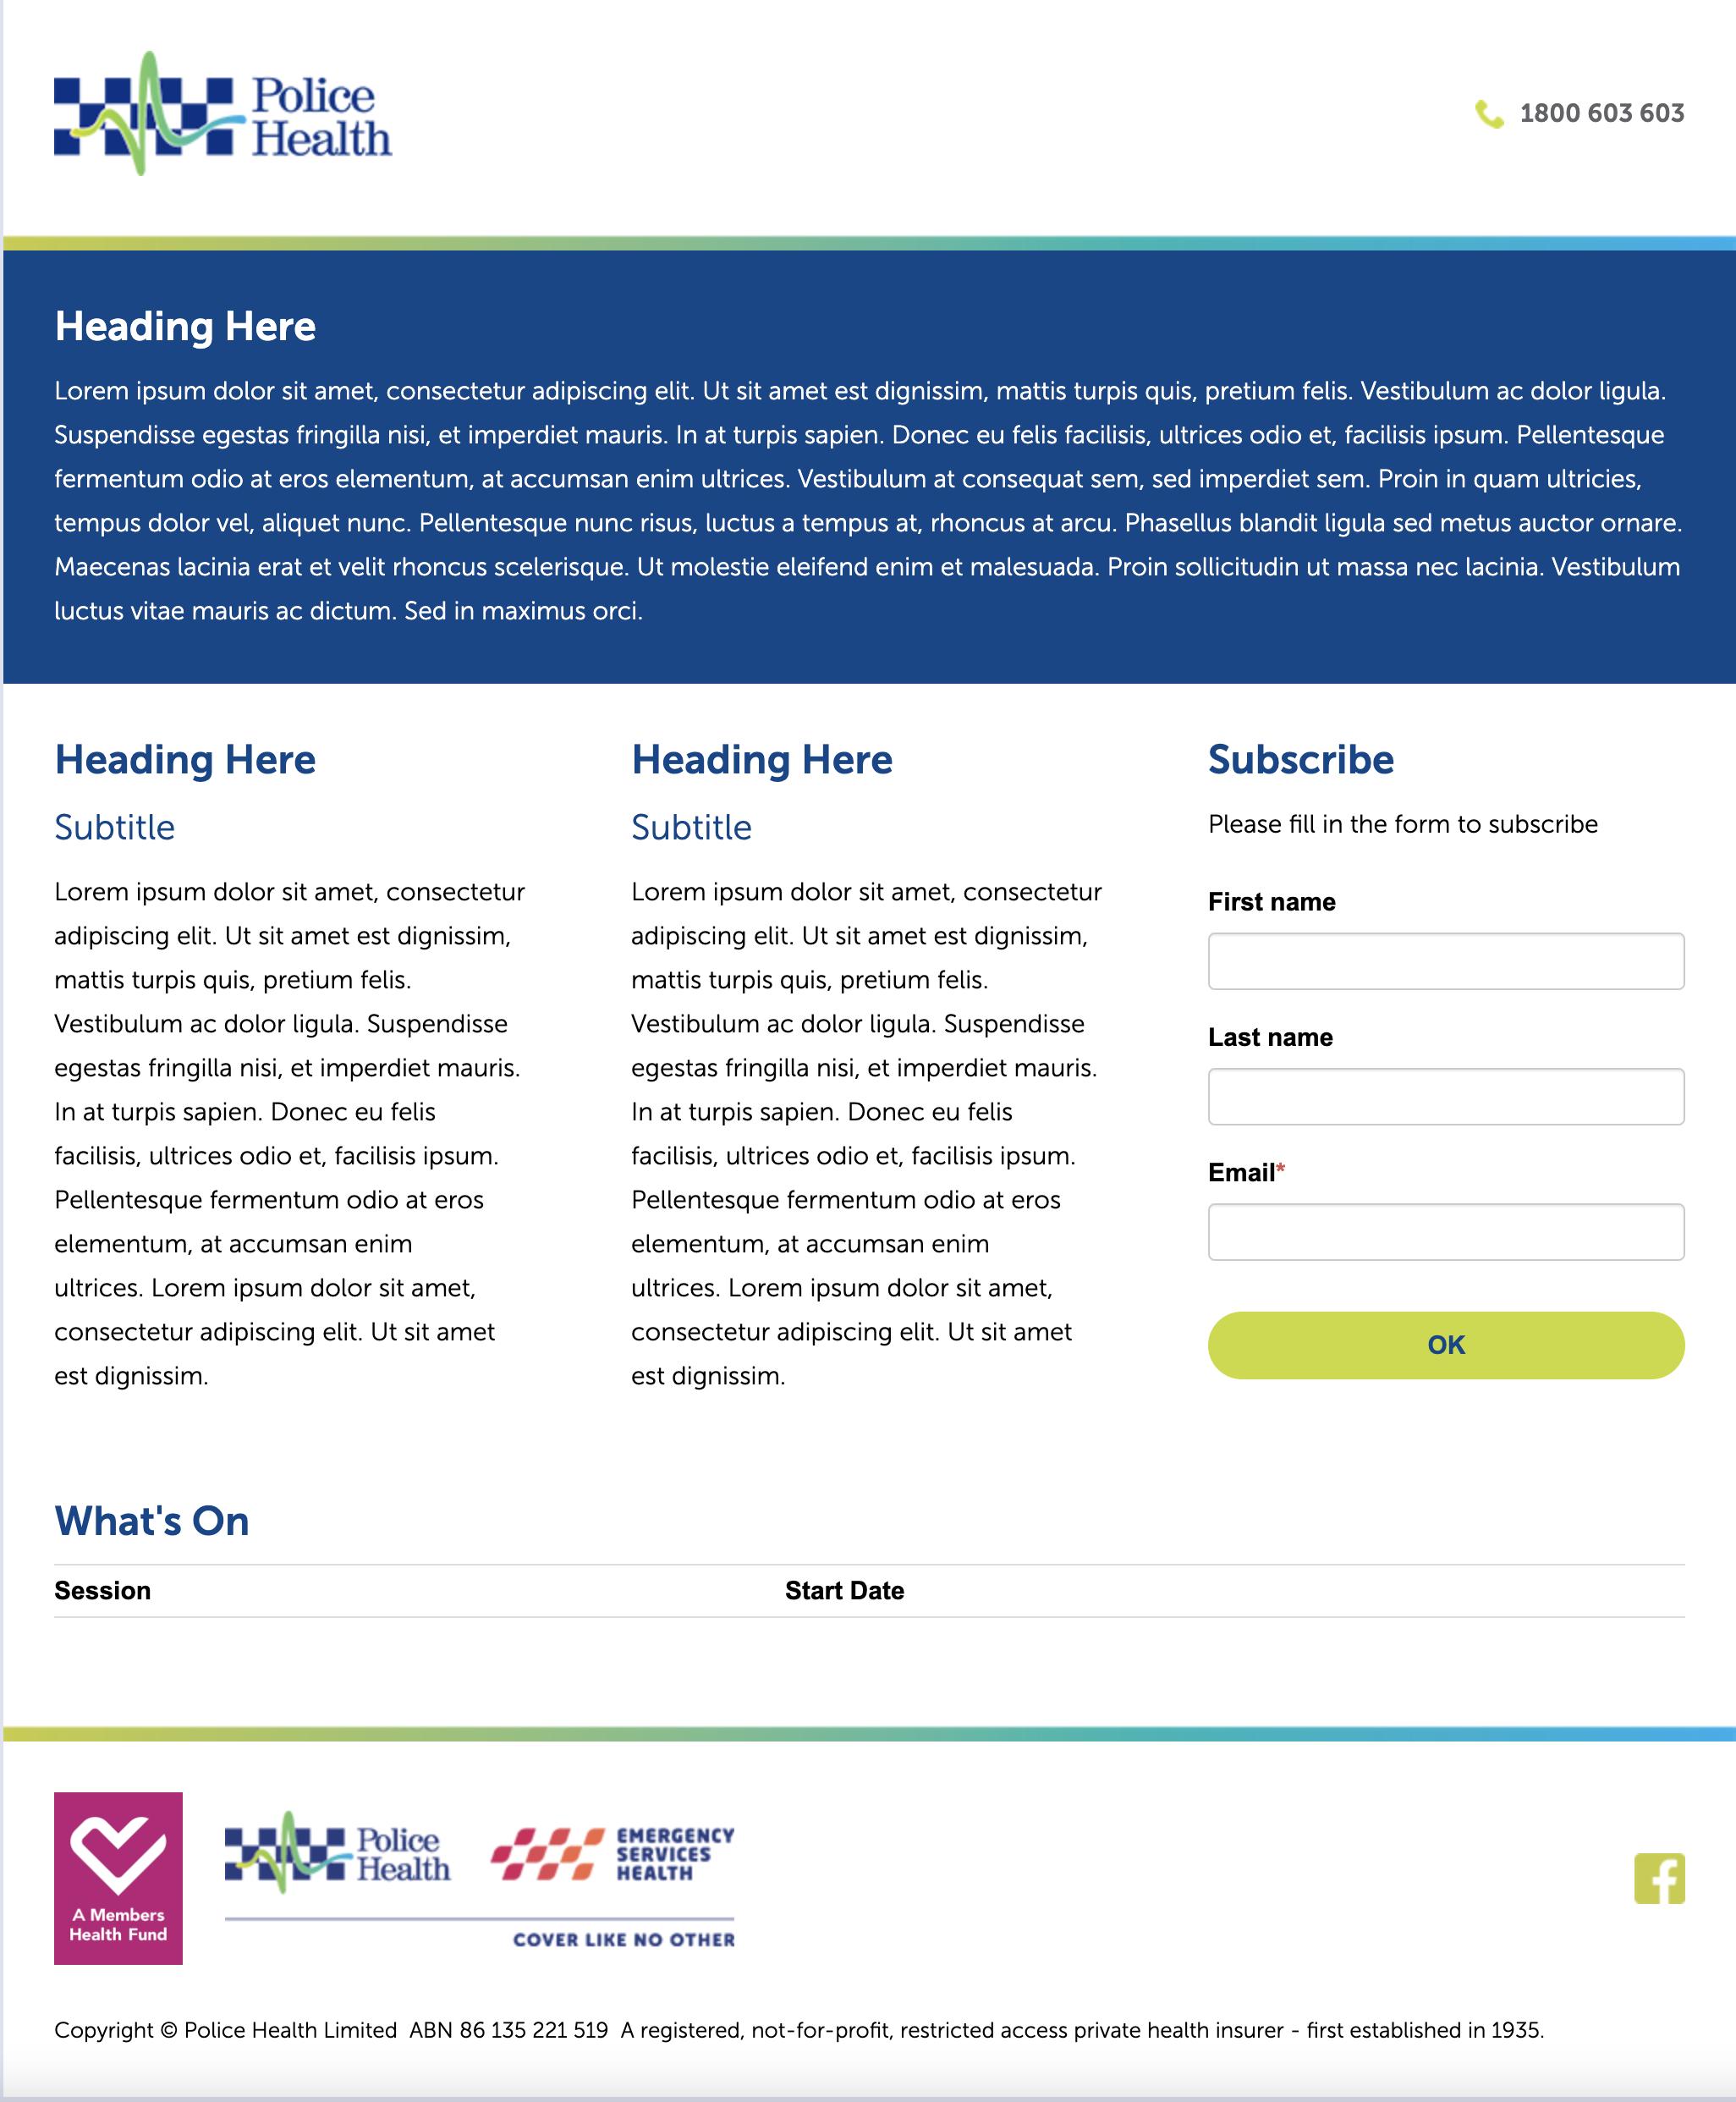 Police Health Landing Page Swift Digital